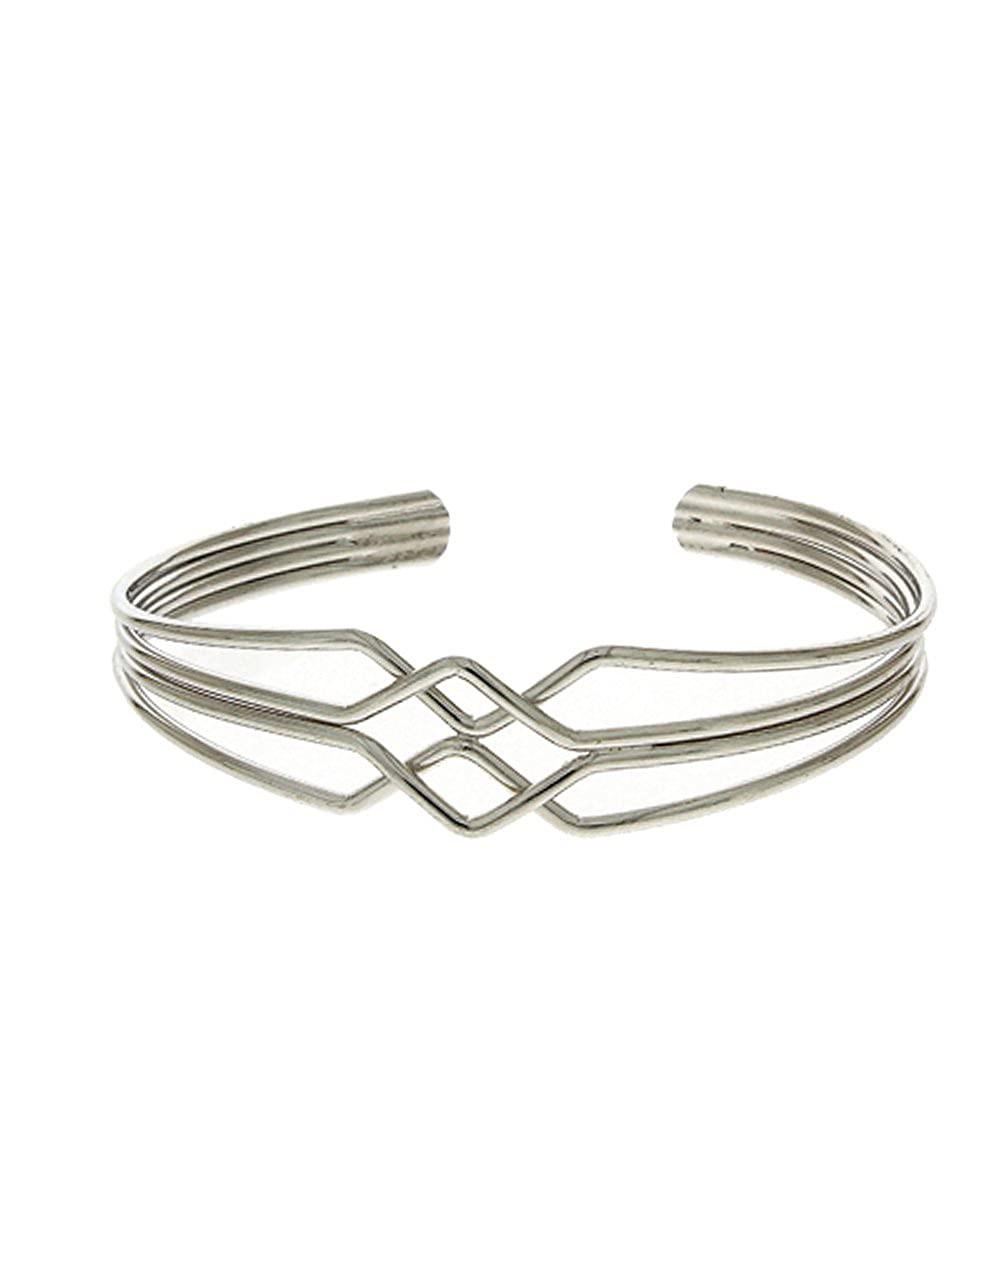 Anuradha Art Silver Finish Different Styled Fancy Hand Bracelet//Kada for Women//Girls